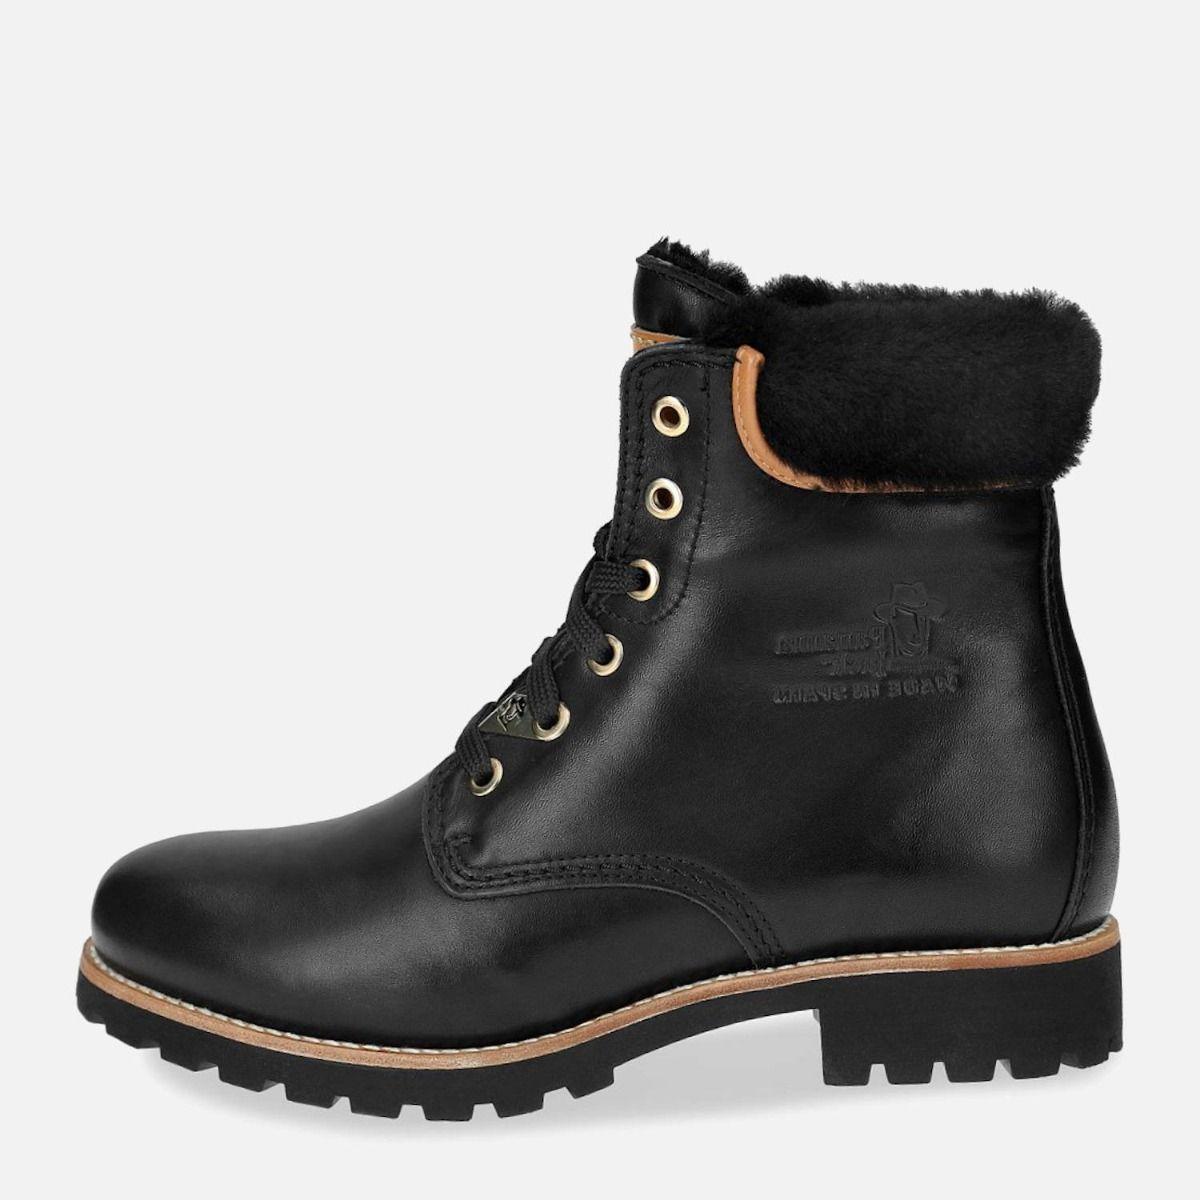 Panama Jack 03 Igloo Travelling Boots